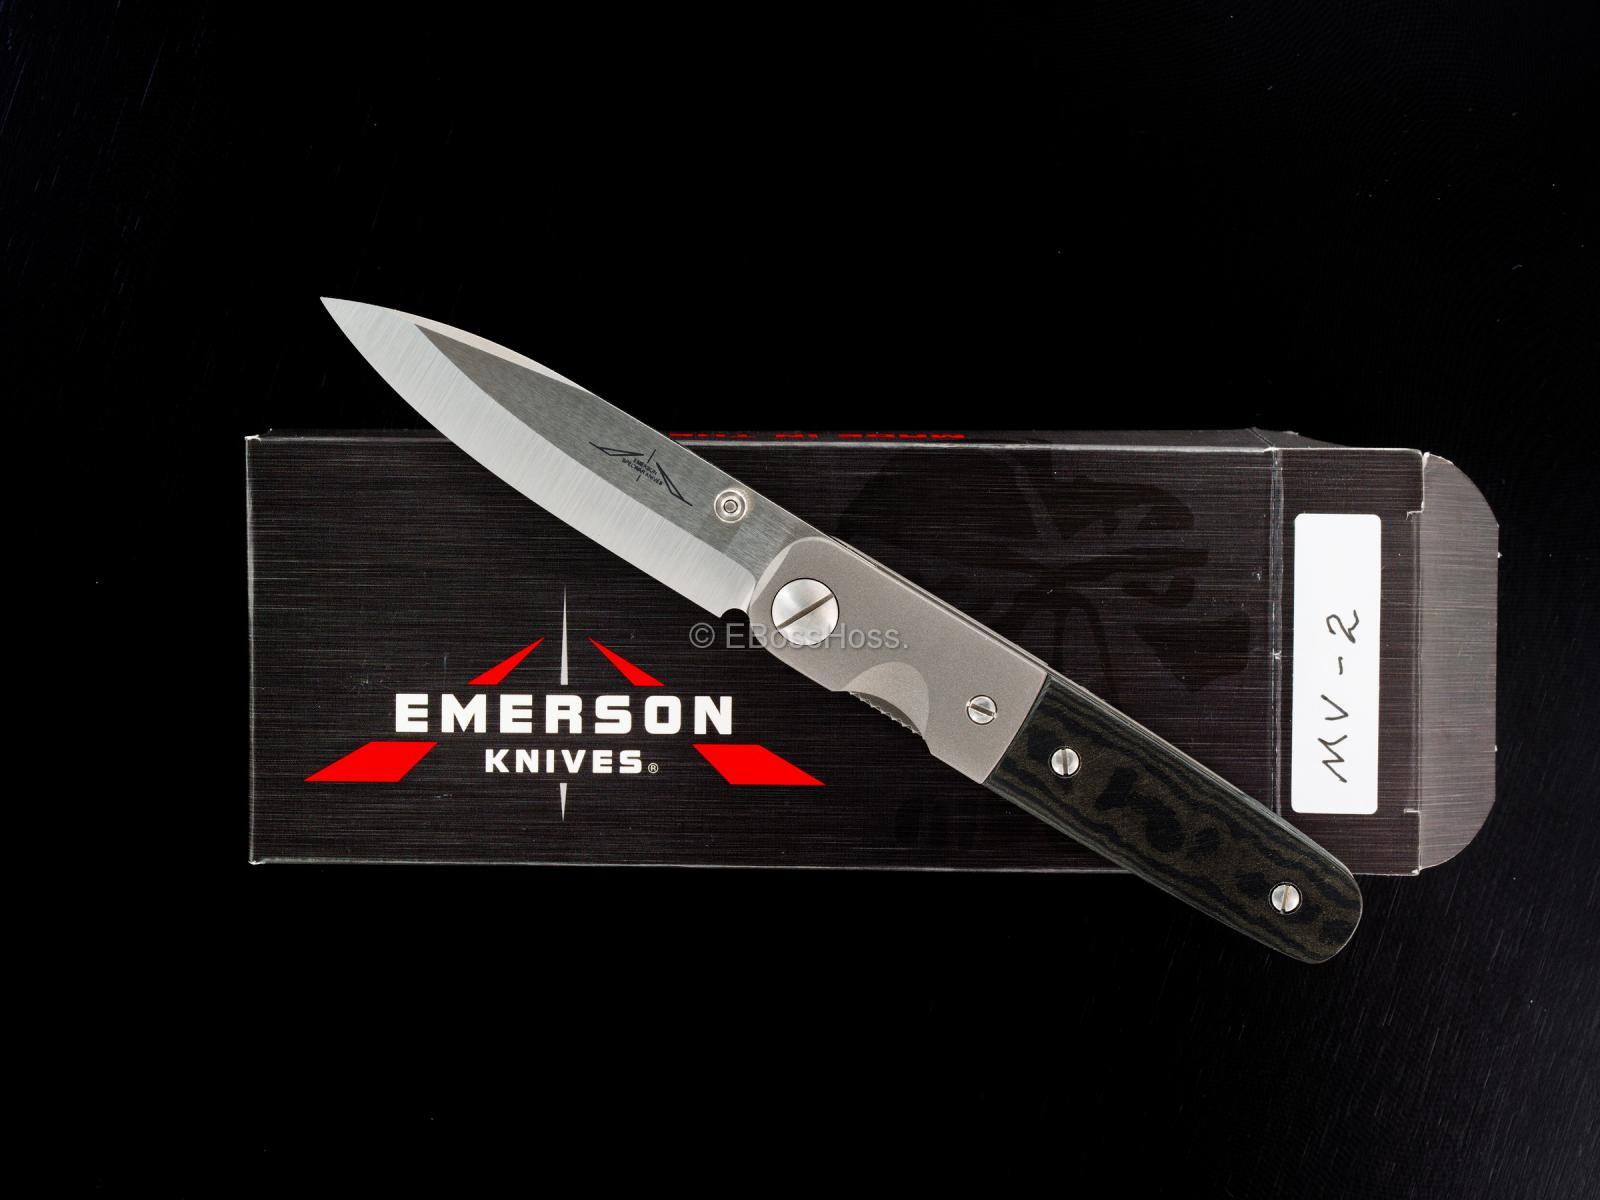 Ernie Emerson Custom MV-2 (aka Viper 2)